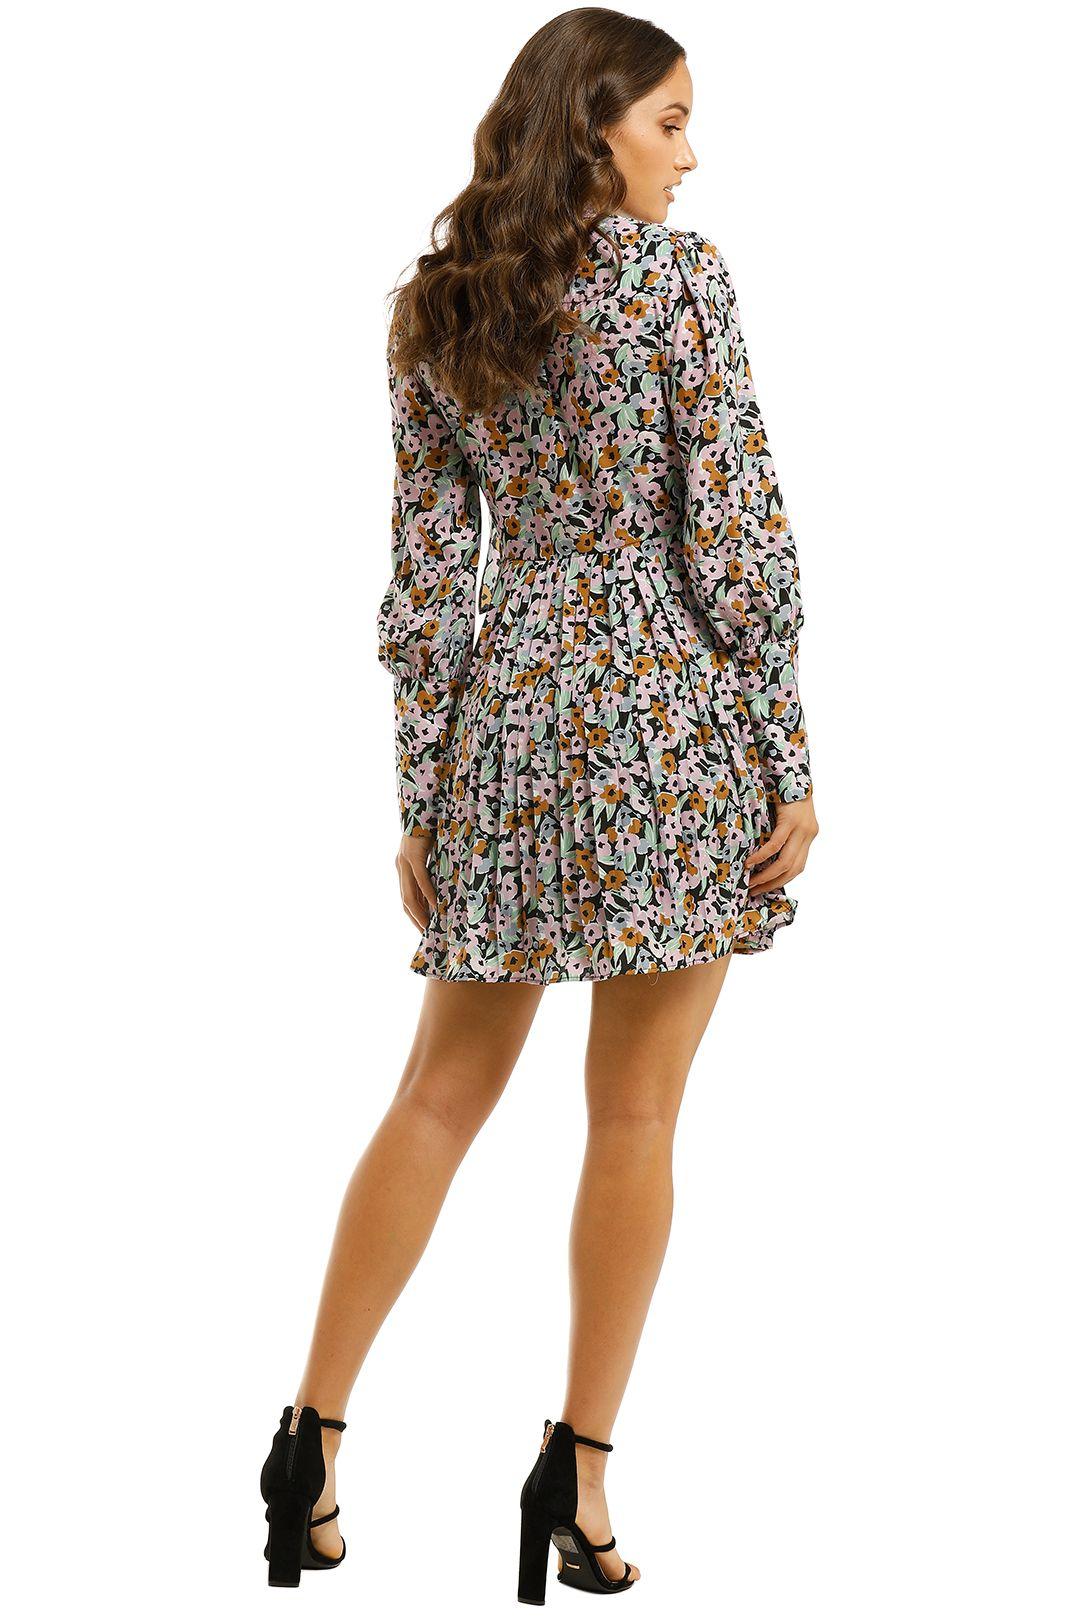 Grace-Willow-Alexis-Dress-Floral-Multi-Back